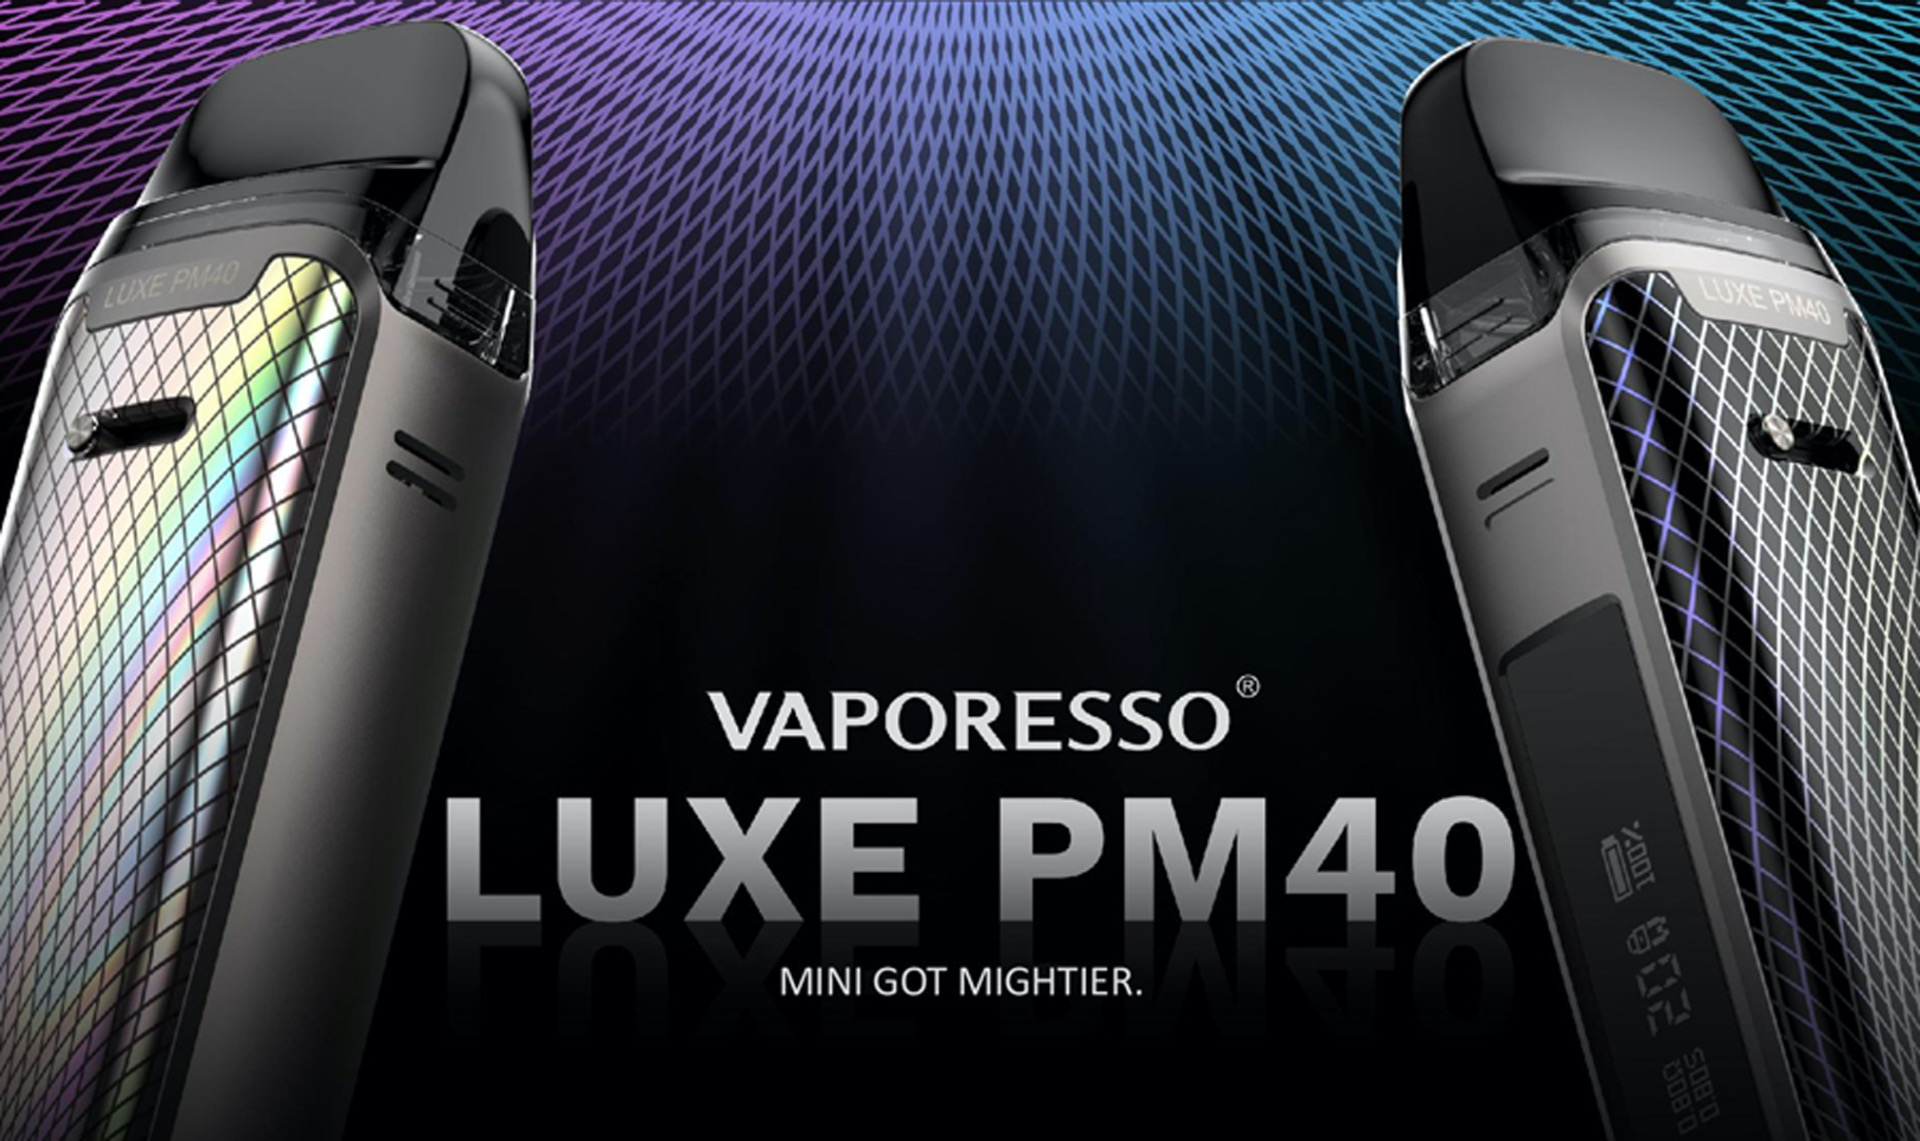 Vaporesso Luxe PM40 pod kit image